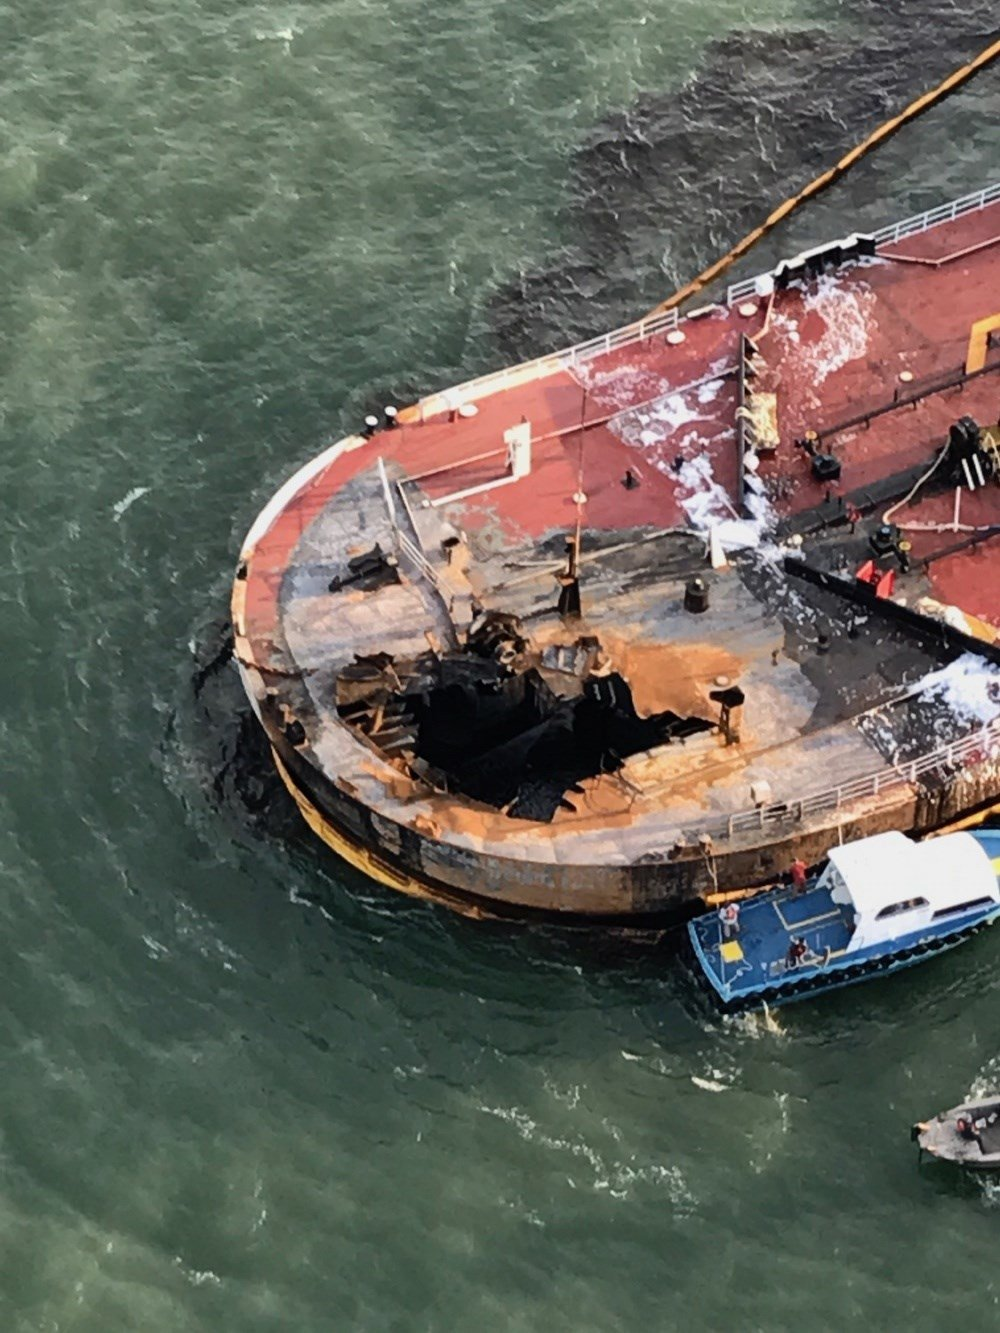 Coast Guard responds to barge fire offshore of Port Aransas, Texas / Courtesy: U.S. Coast Guard